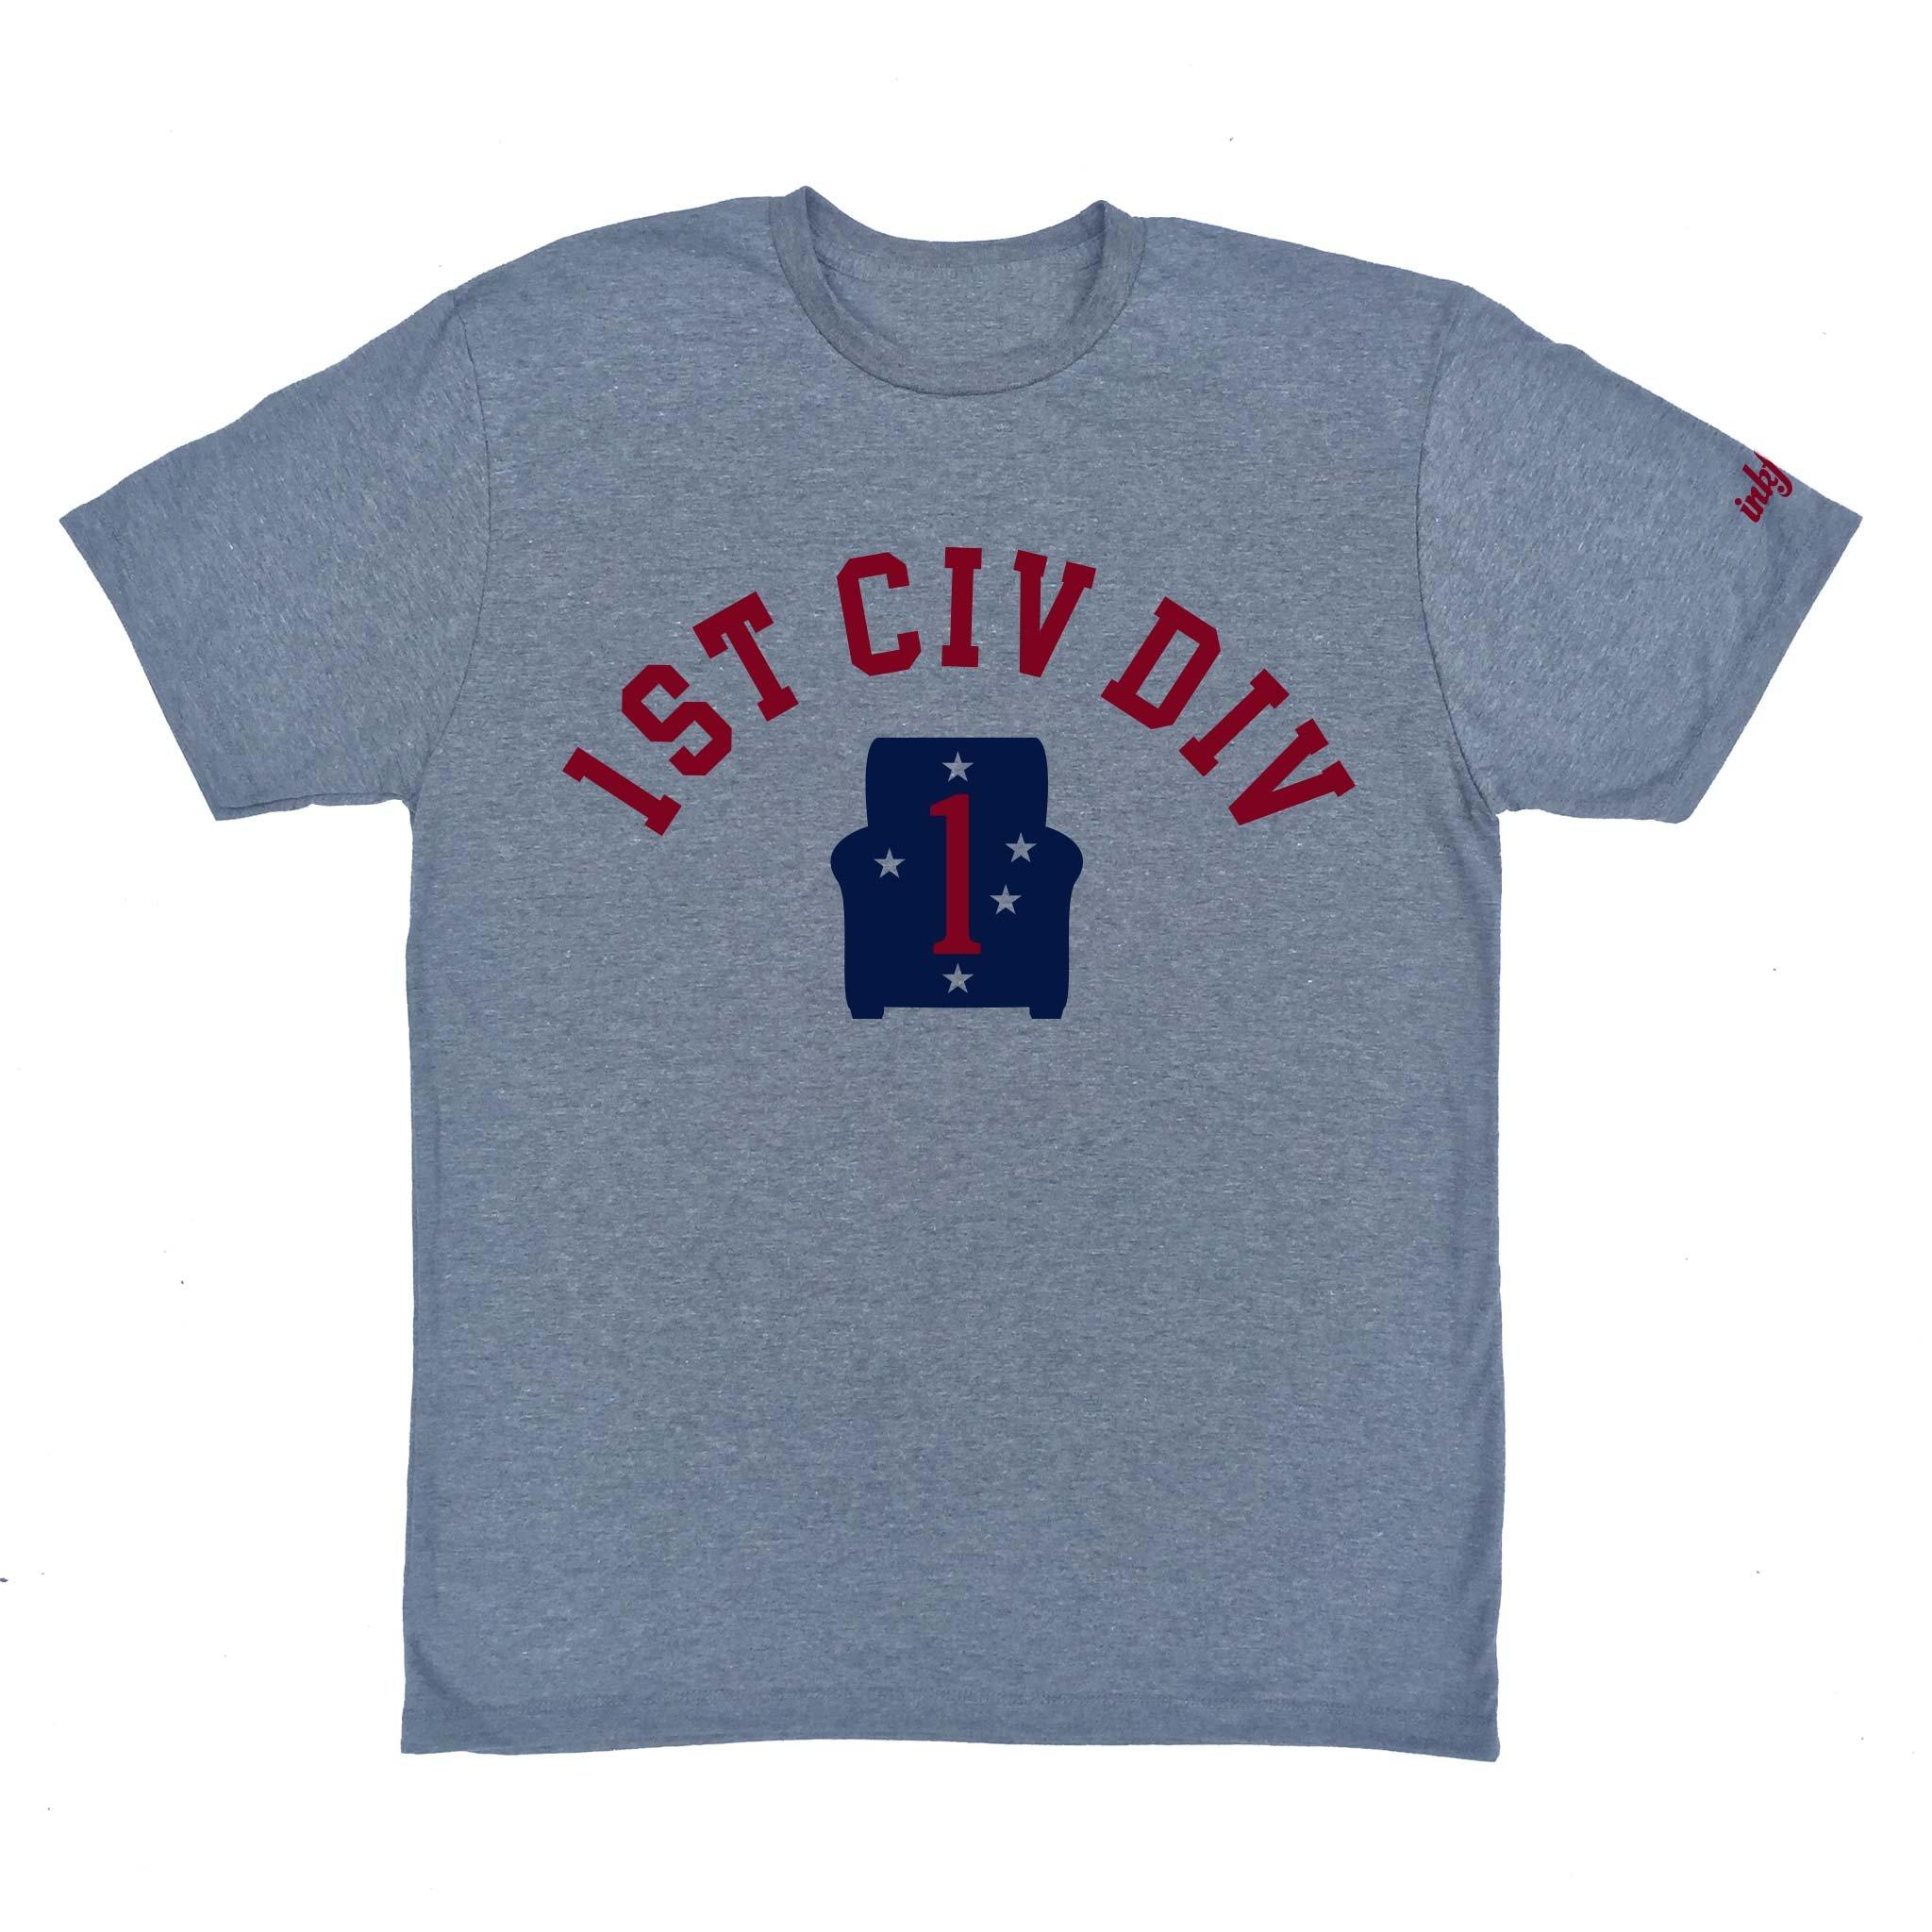 Inkfidel 1st Civ DIV T-Shirt - First Civilian Division Tee - Veteran Apparel - Athletic Grey Graphic T-Shirt - 50% Cotton/50% Polyester (Medium)